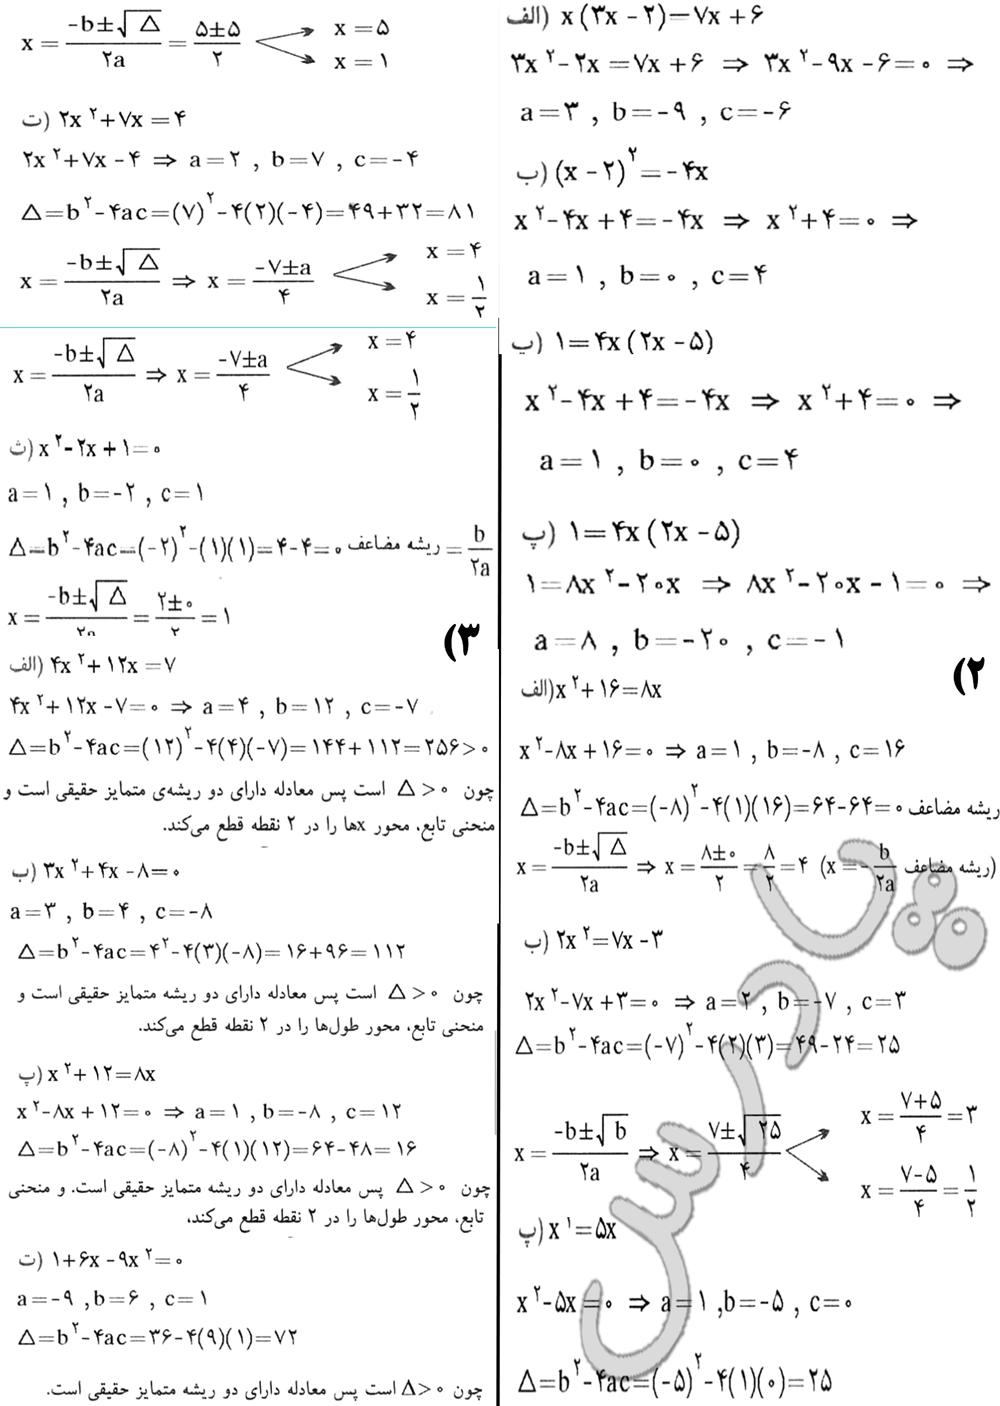 حل مسائل صفحه 67 ریاضی سوم انسانی